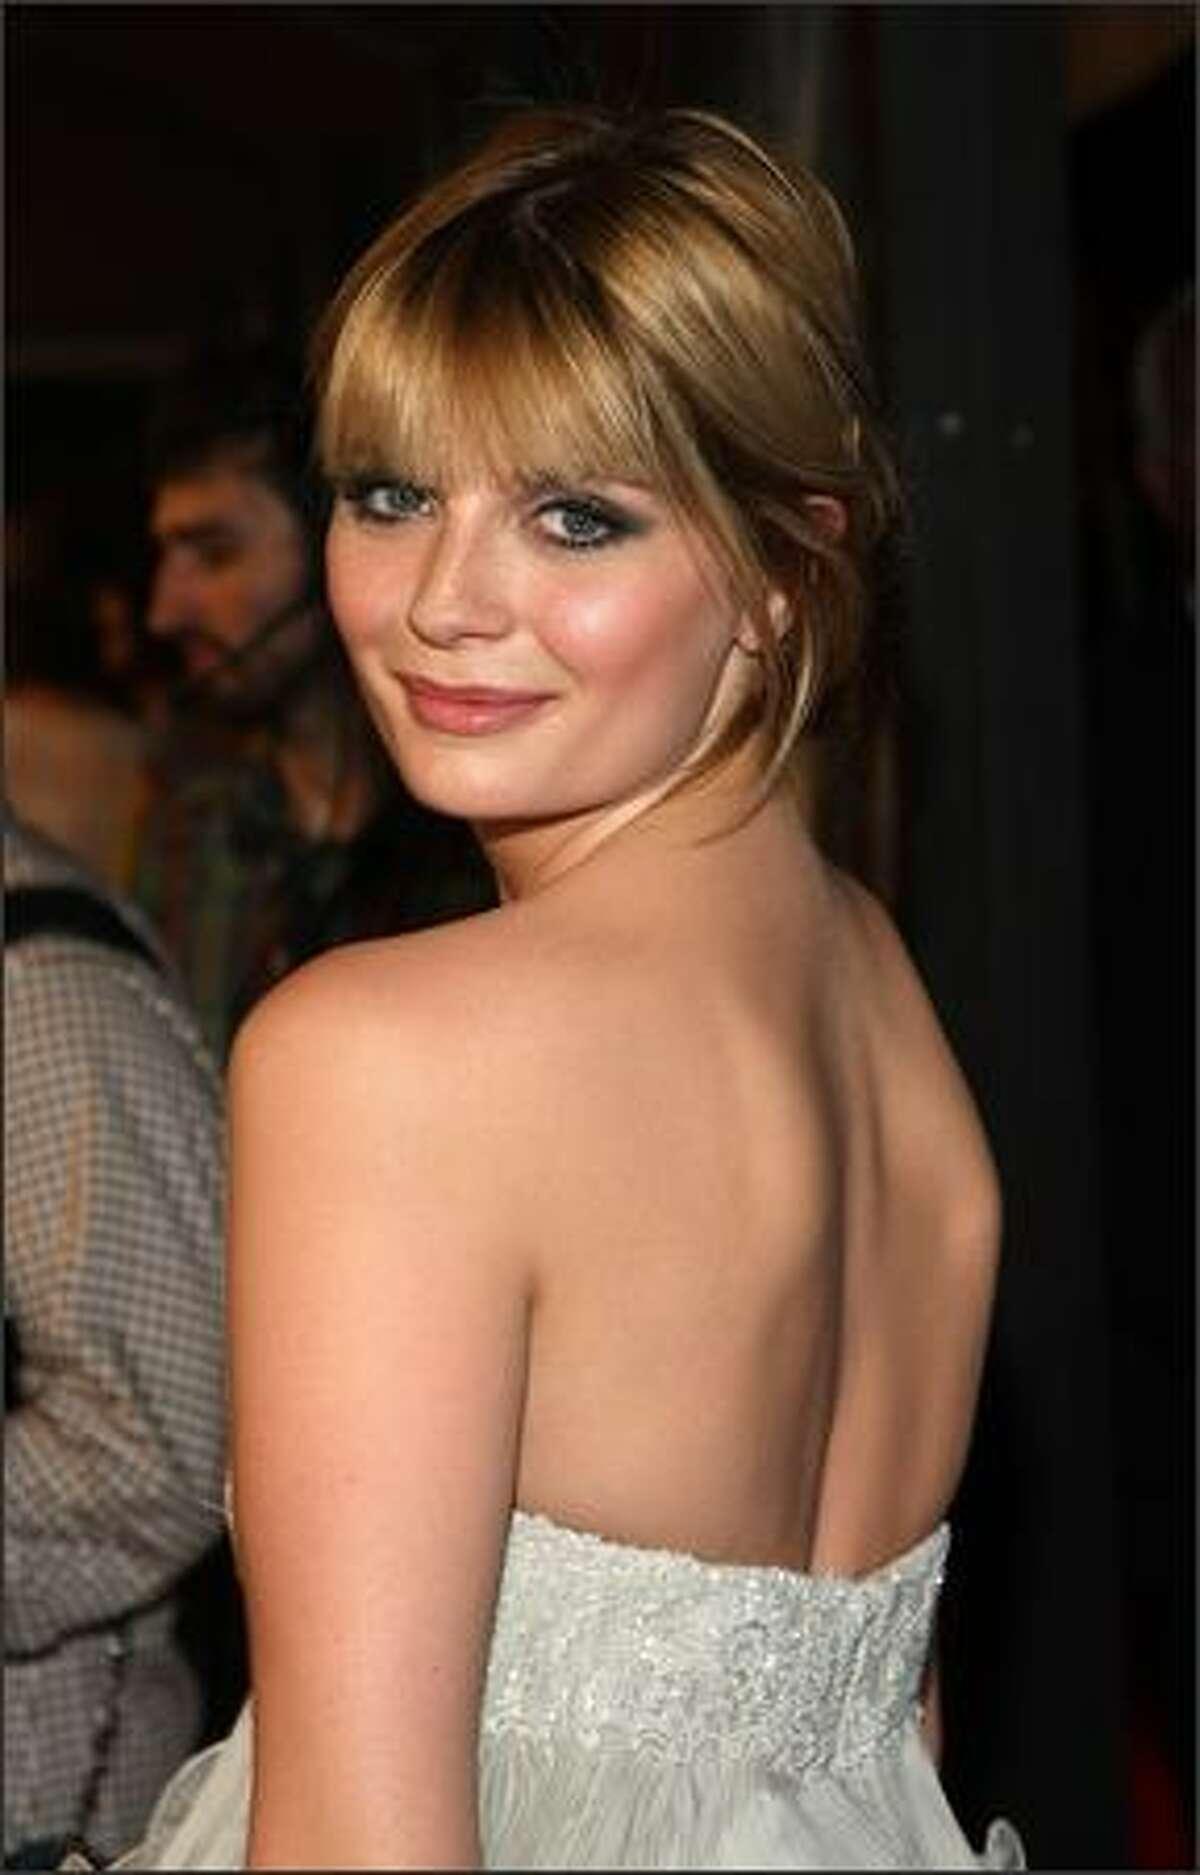 Actress Mischa Barton.